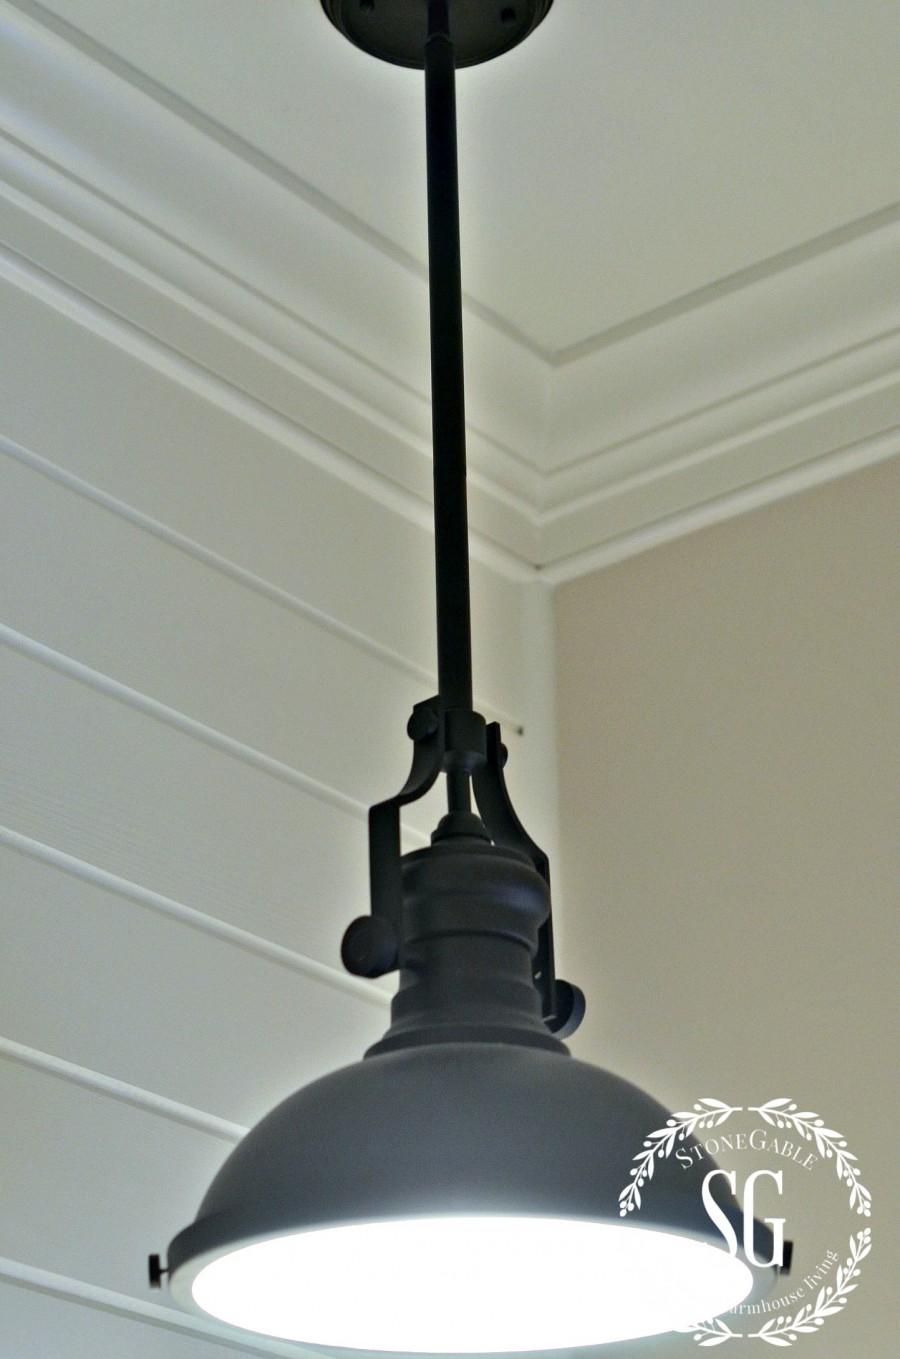 FARMHOUSE POWDER ROOM REVEAL-industrial lamp-stonegableblog.com